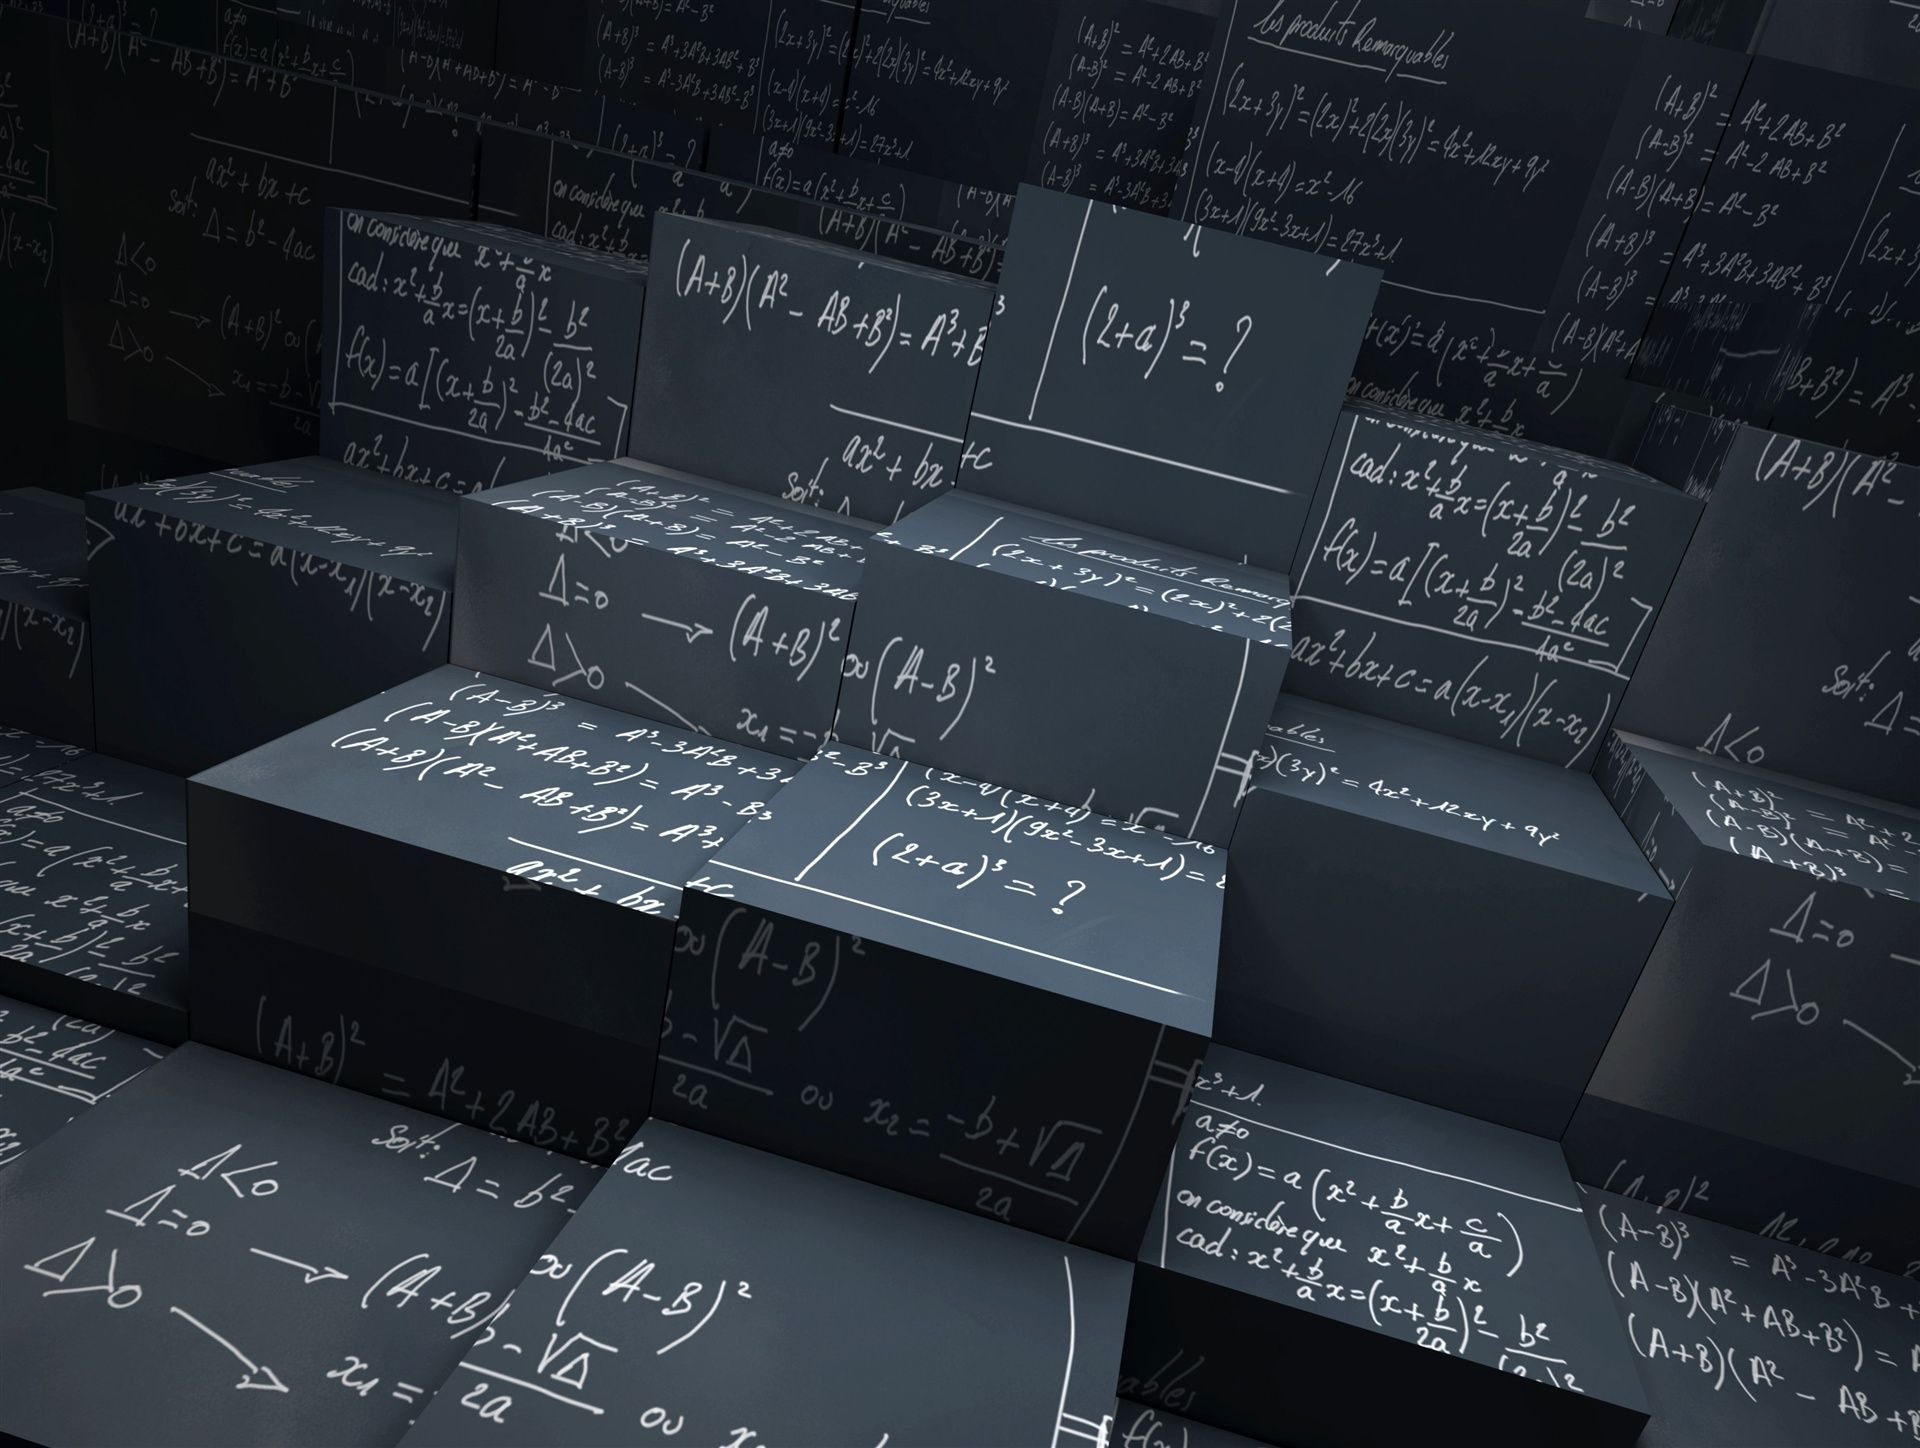 Mathematics Science Geometry Cubism Equation Cubist Architecture Statistics